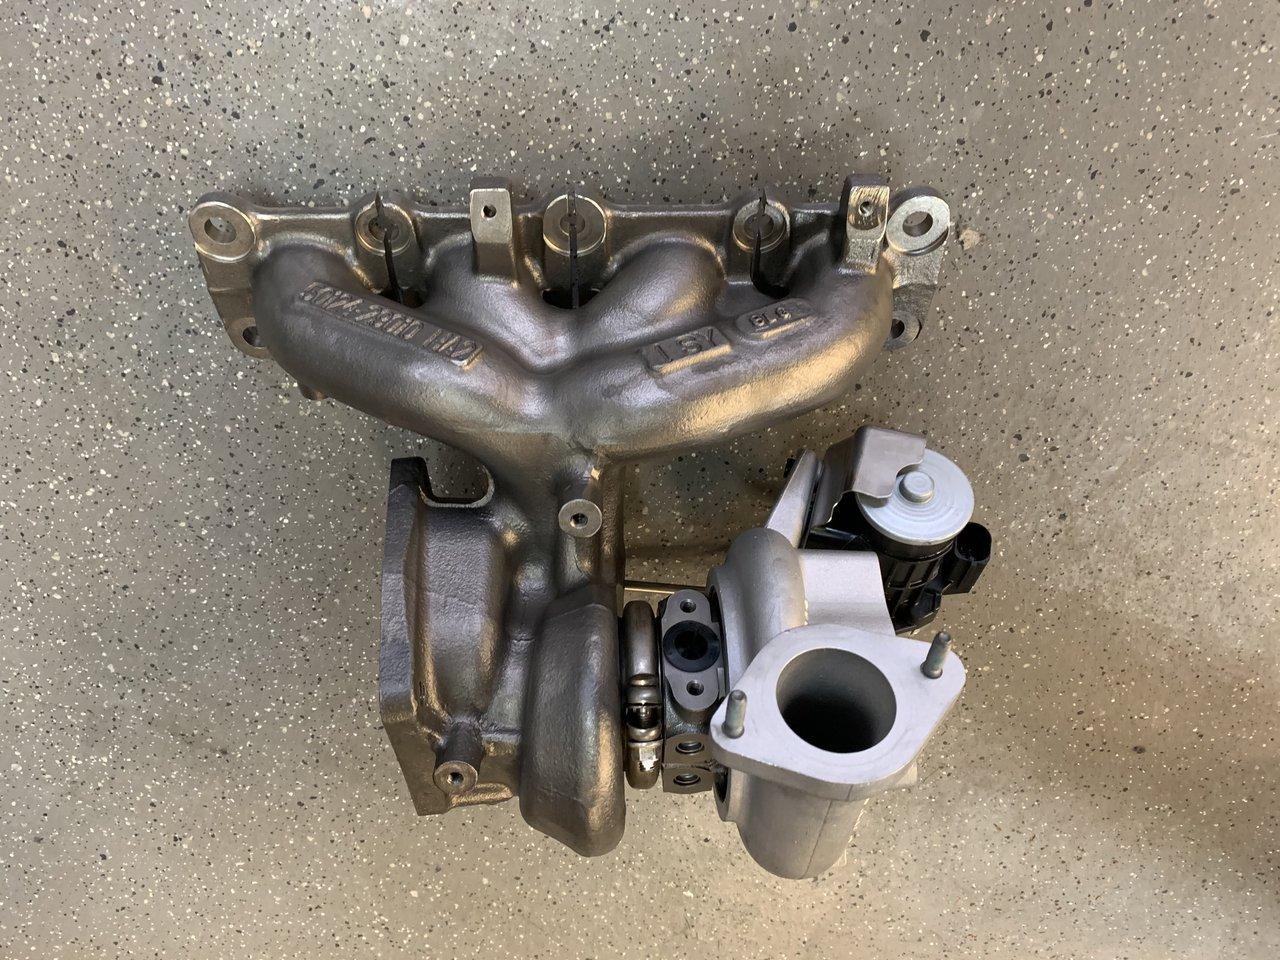 i30n veloster n upgrade turbo 450hp